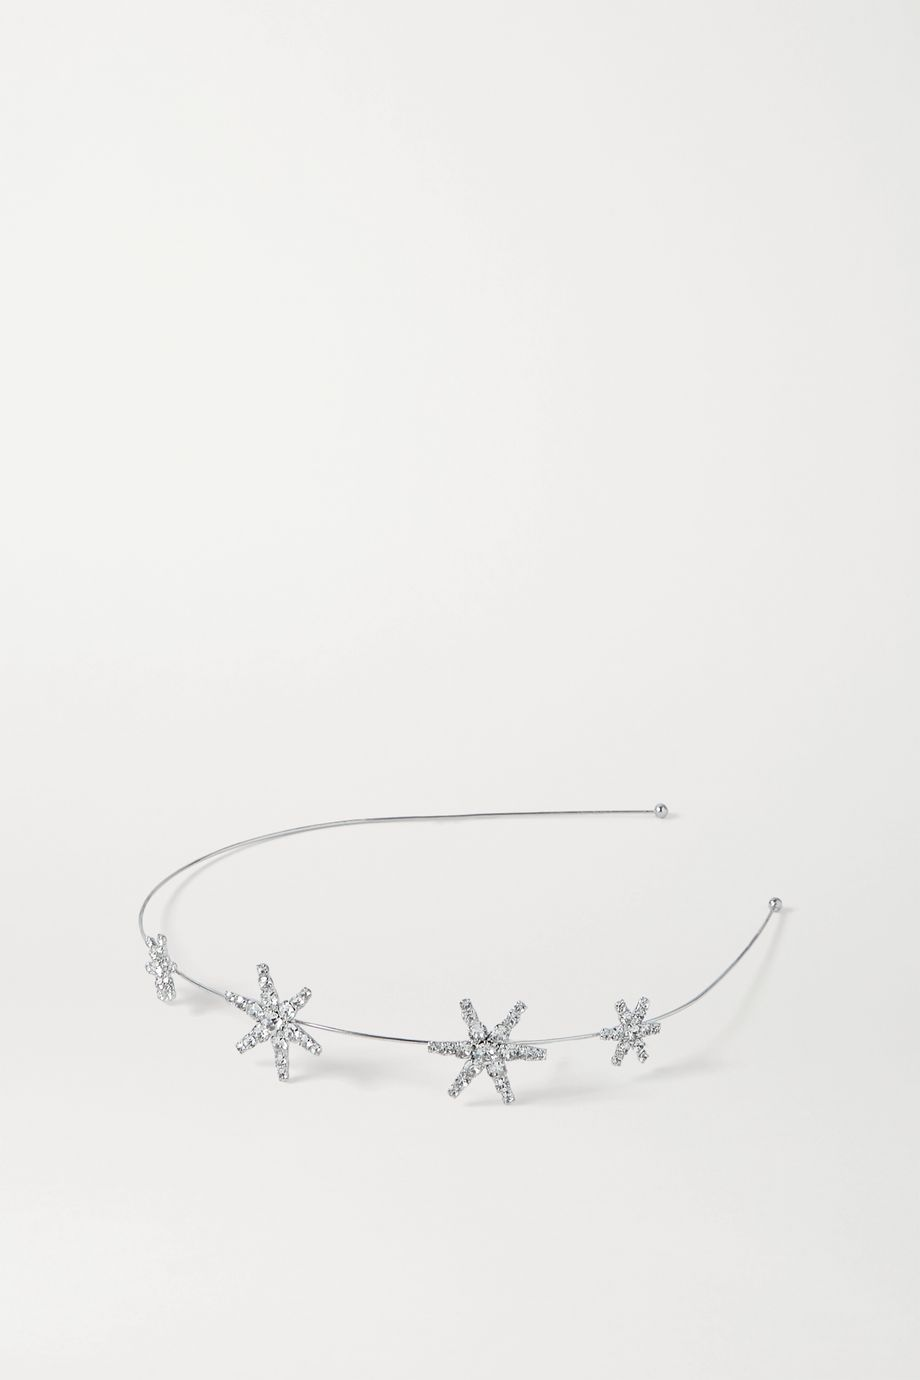 Jennifer Behr Hila rhodium-plated Swarovski crystal headband